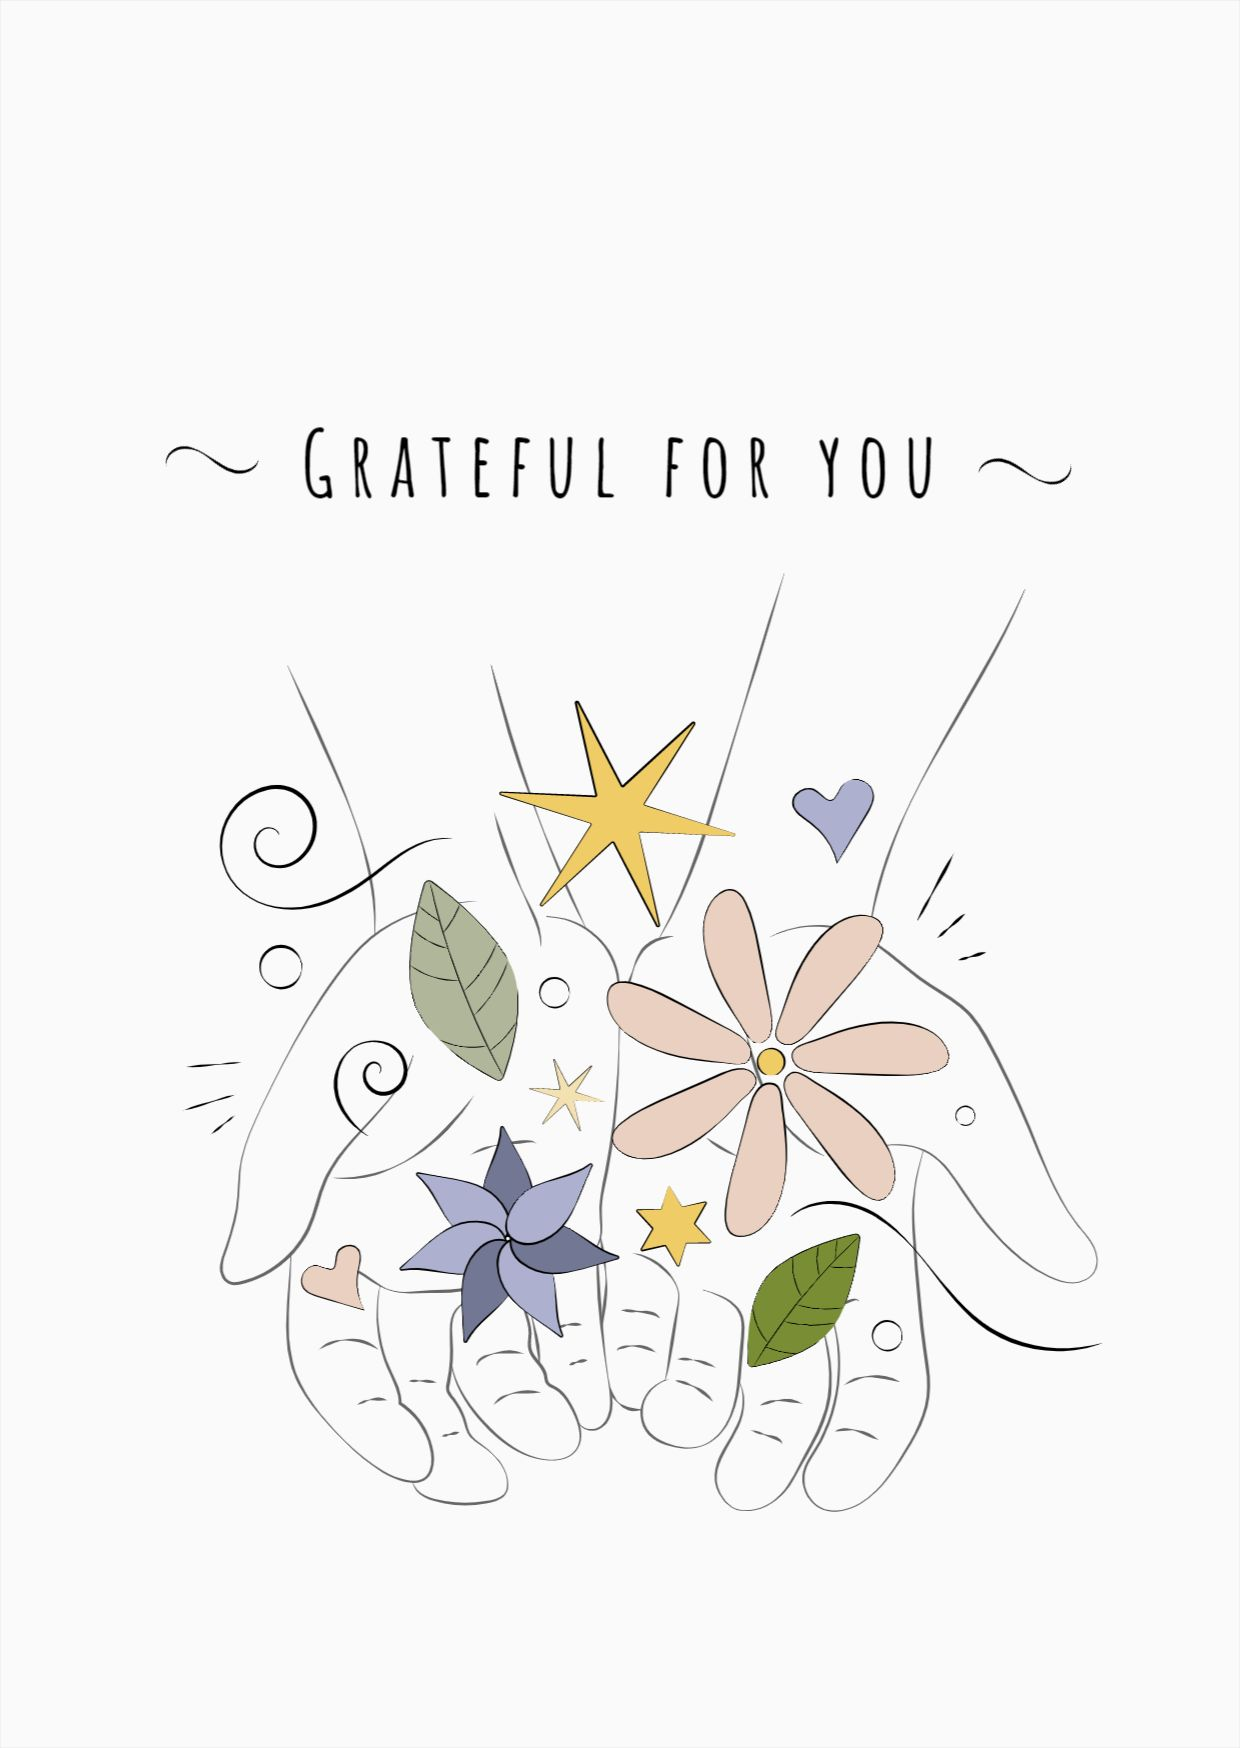 Grateful Hands Greeting Card Design Template